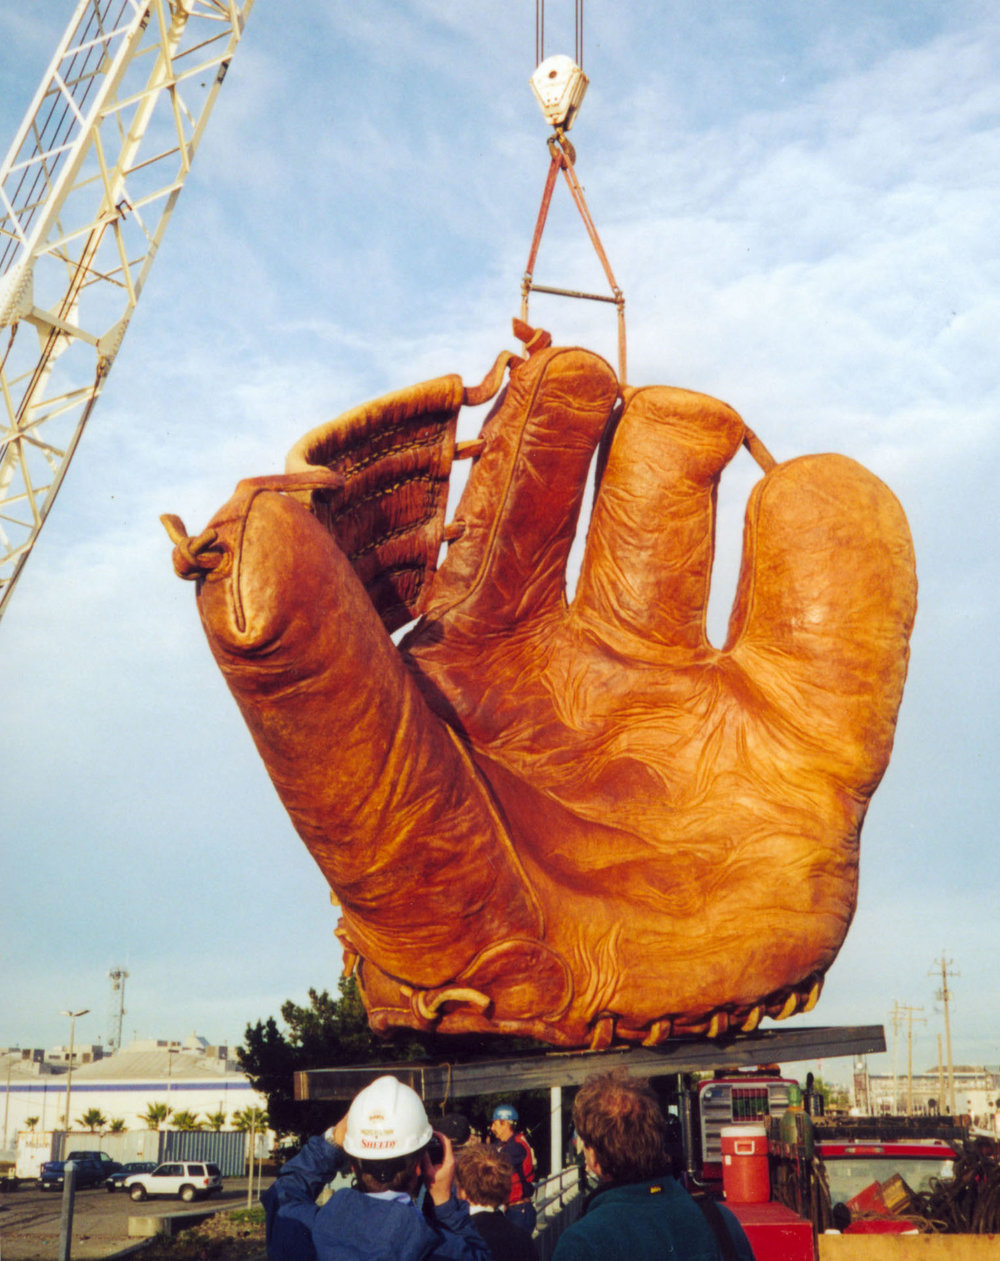 Giant baseball mitt installation at AT&T Park in San Francisco